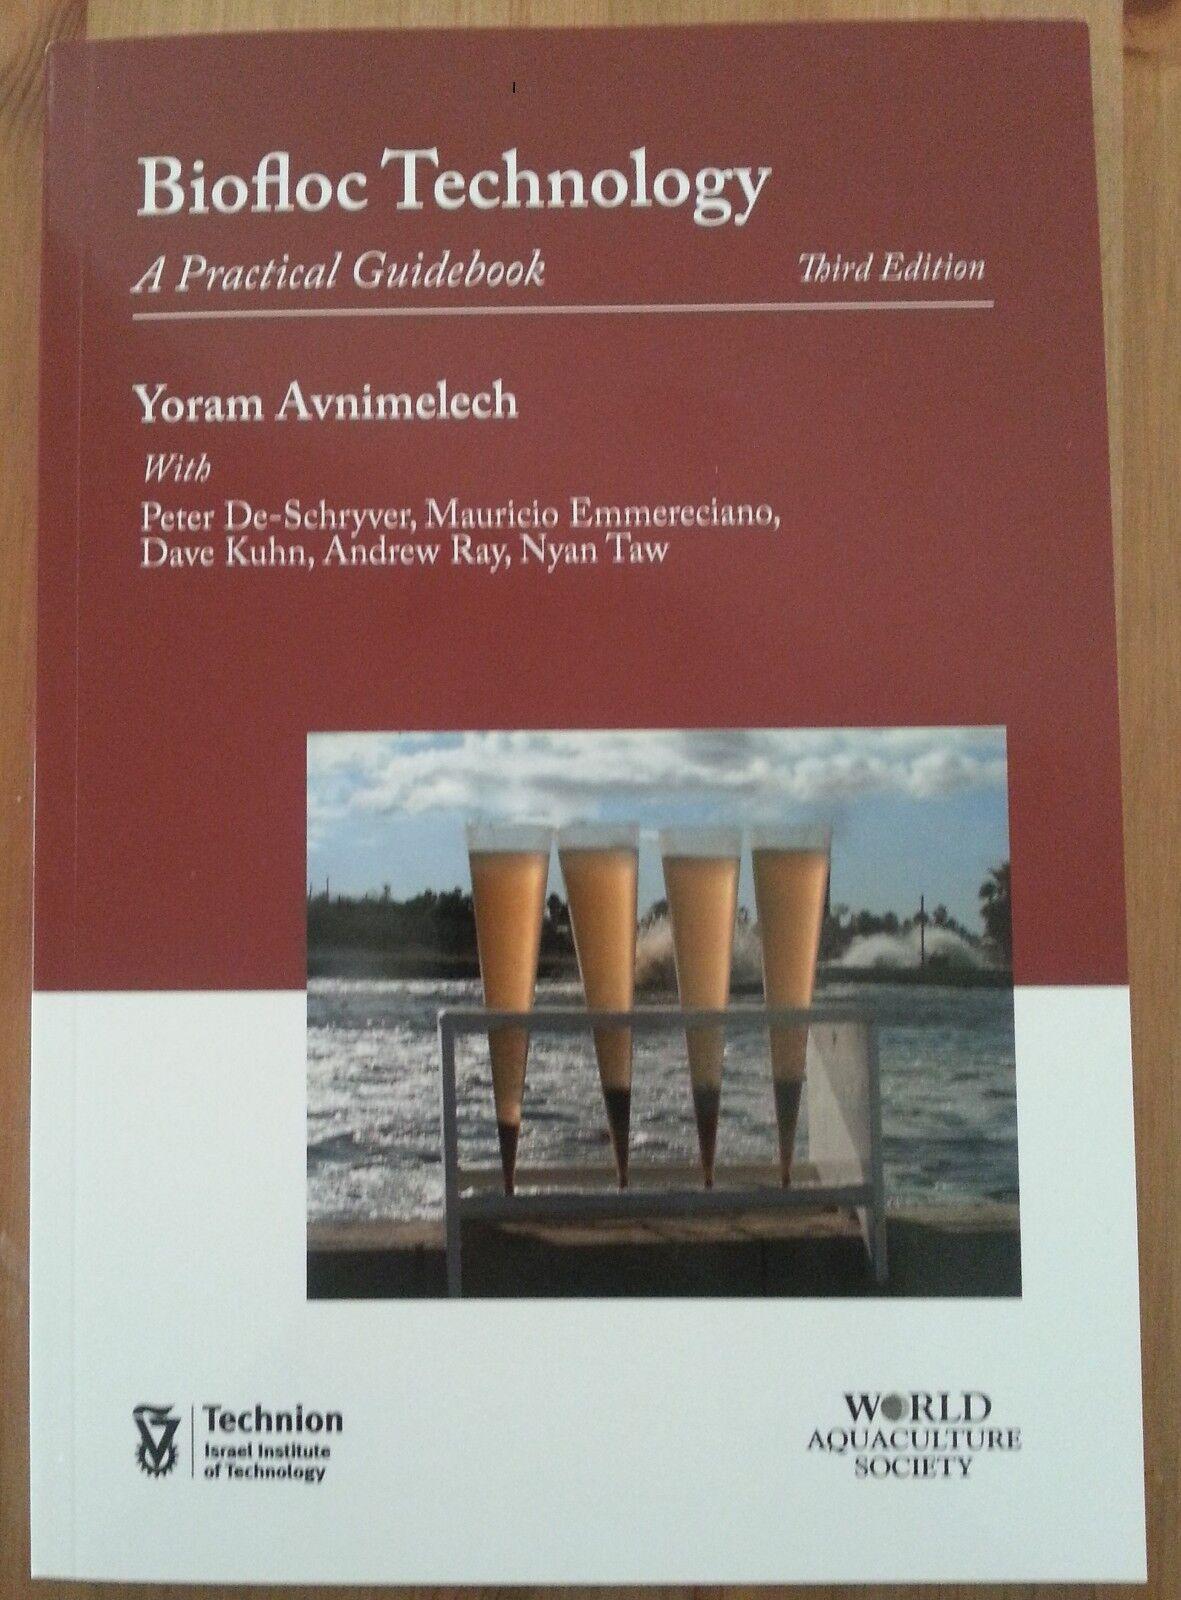 Biofloc Technology : A Practical Guide Book by Yoram Avnimelech (2015,  Paperback)